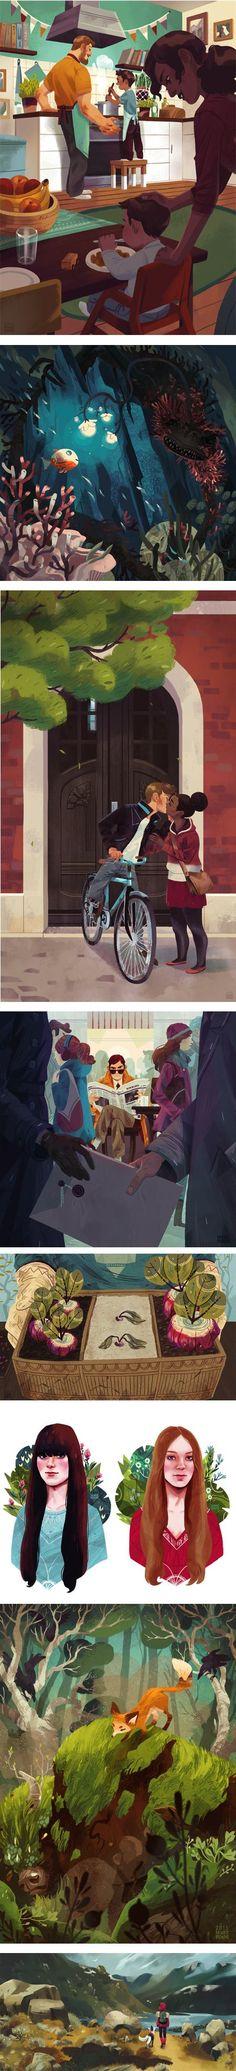 Illustration – Page 23 Art And Illustration, Illustrations And Posters, Character Illustration, Bg Design, Dibujos Cute, Art Plastique, Art Inspo, Amazing Art, Book Art